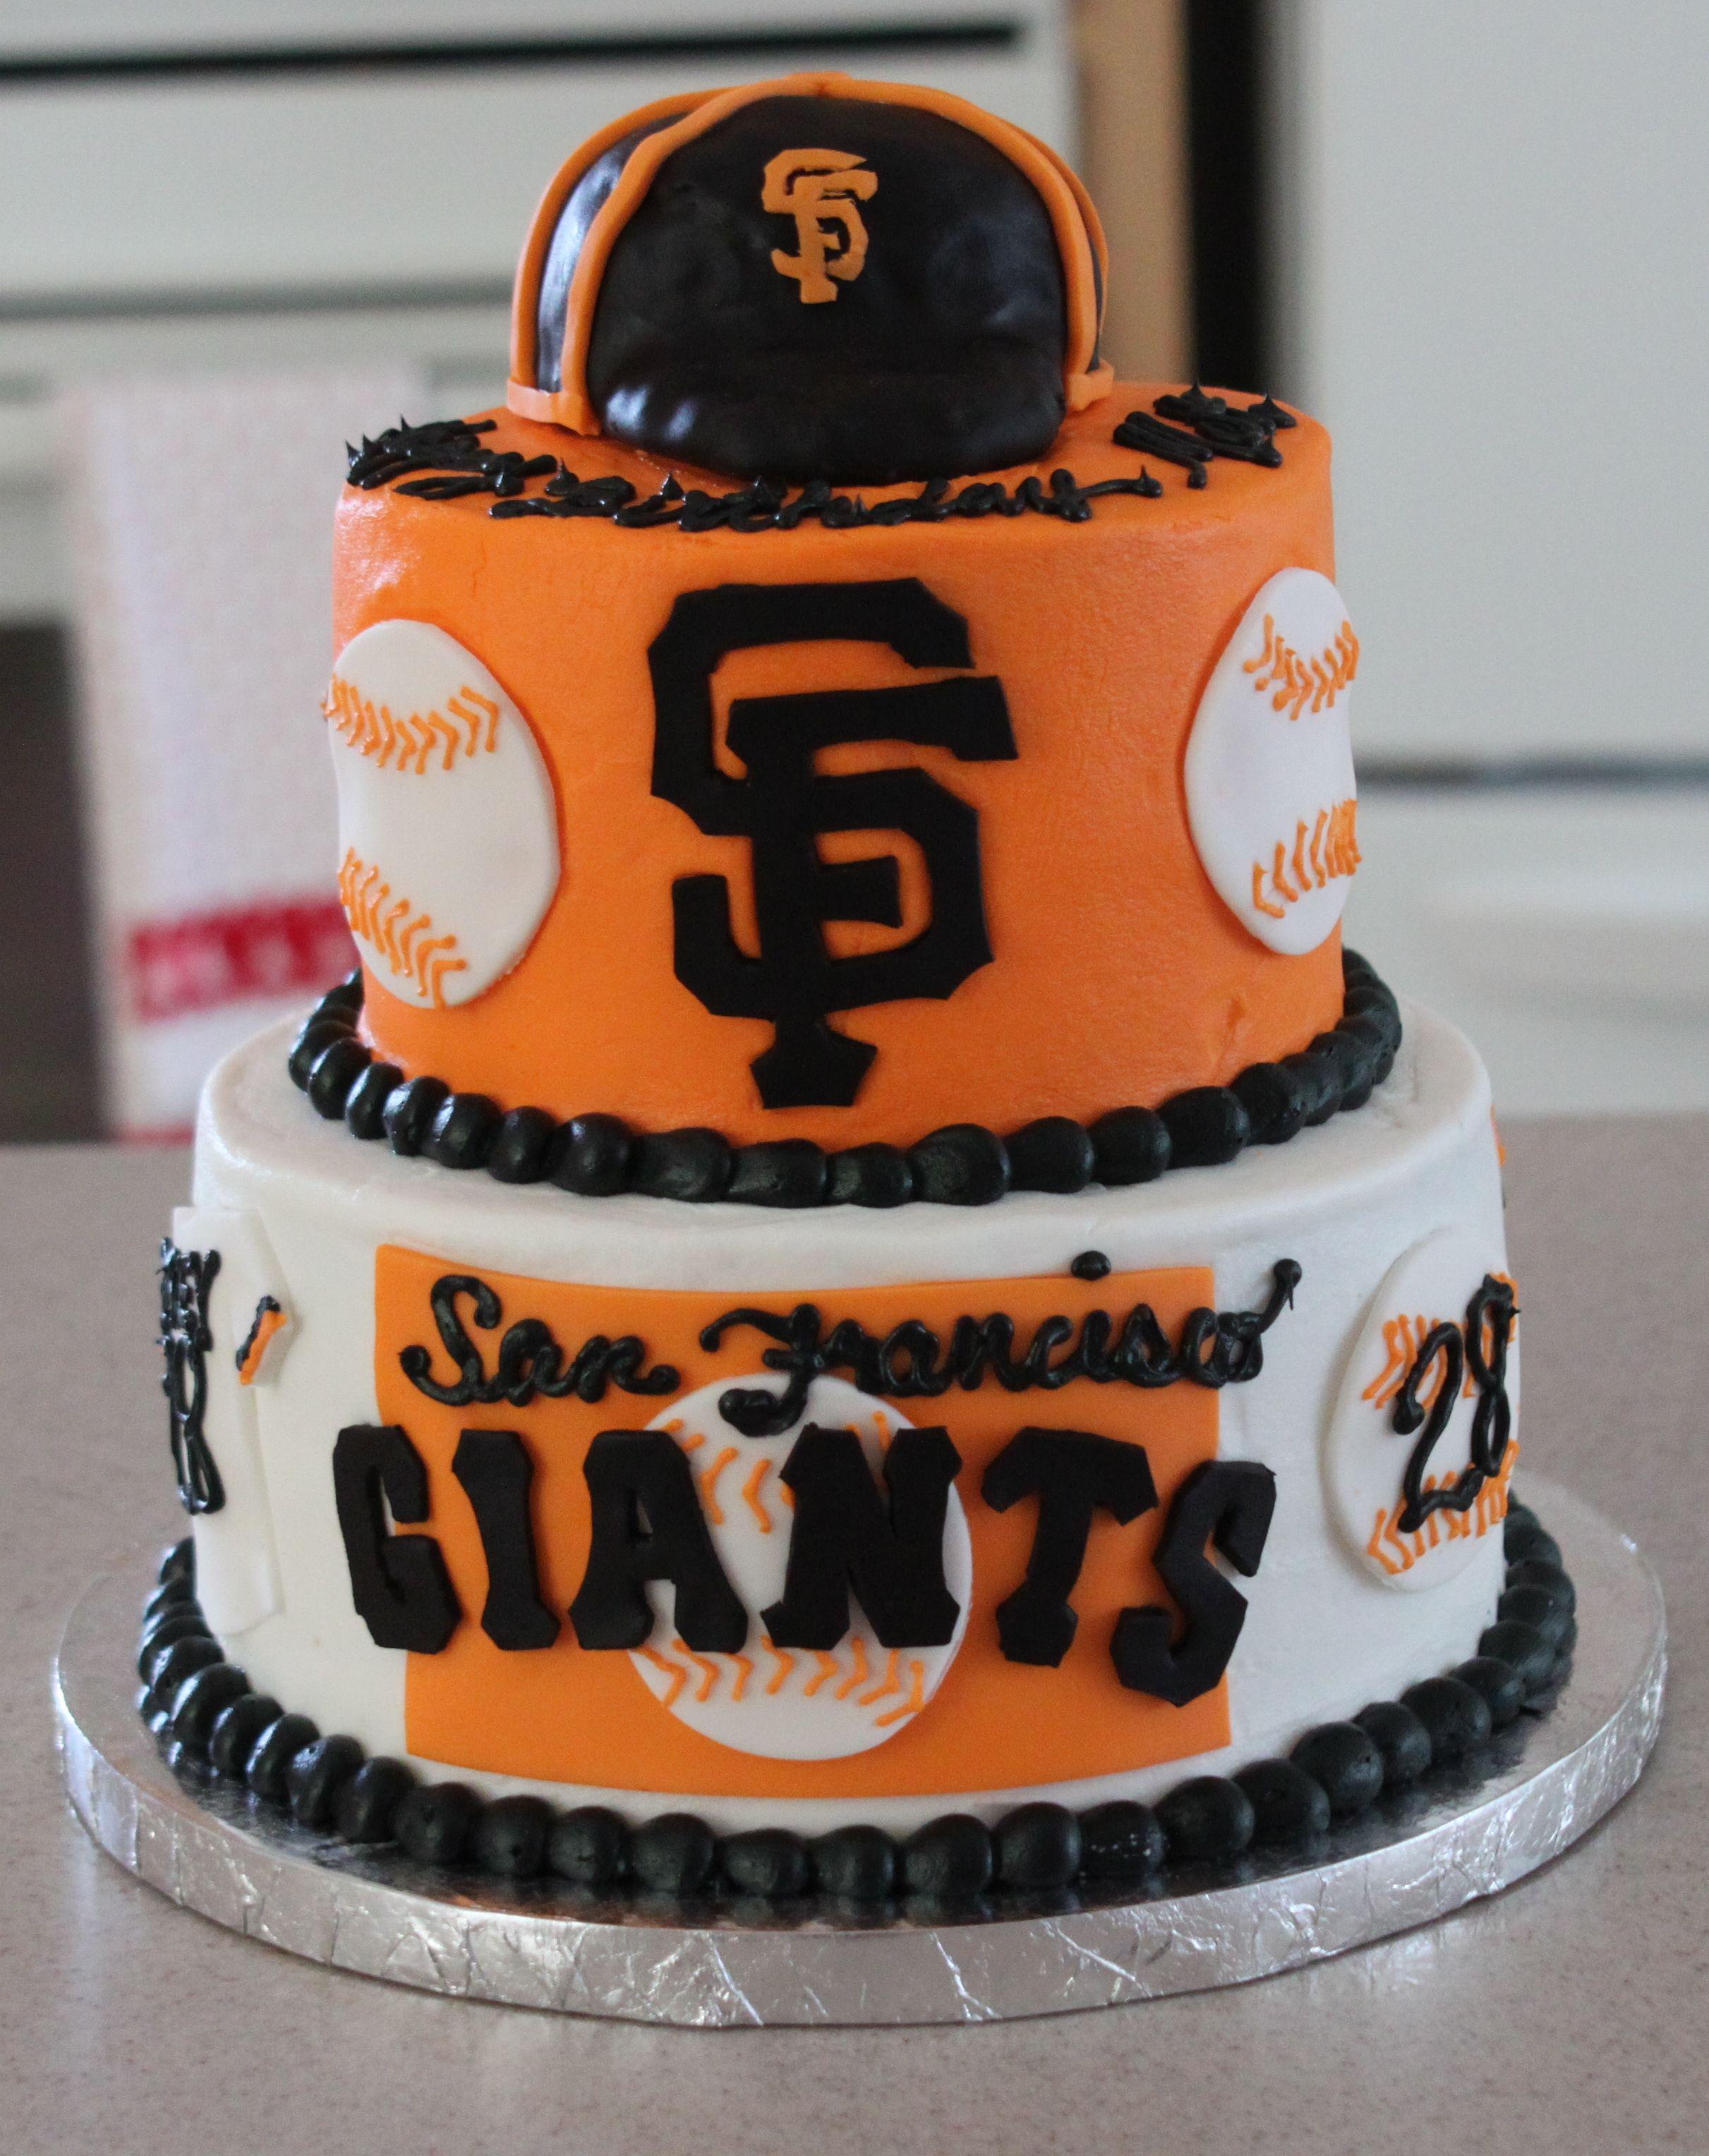 San Francisco Giants Birthday Cake - All buttercream with fondant ...